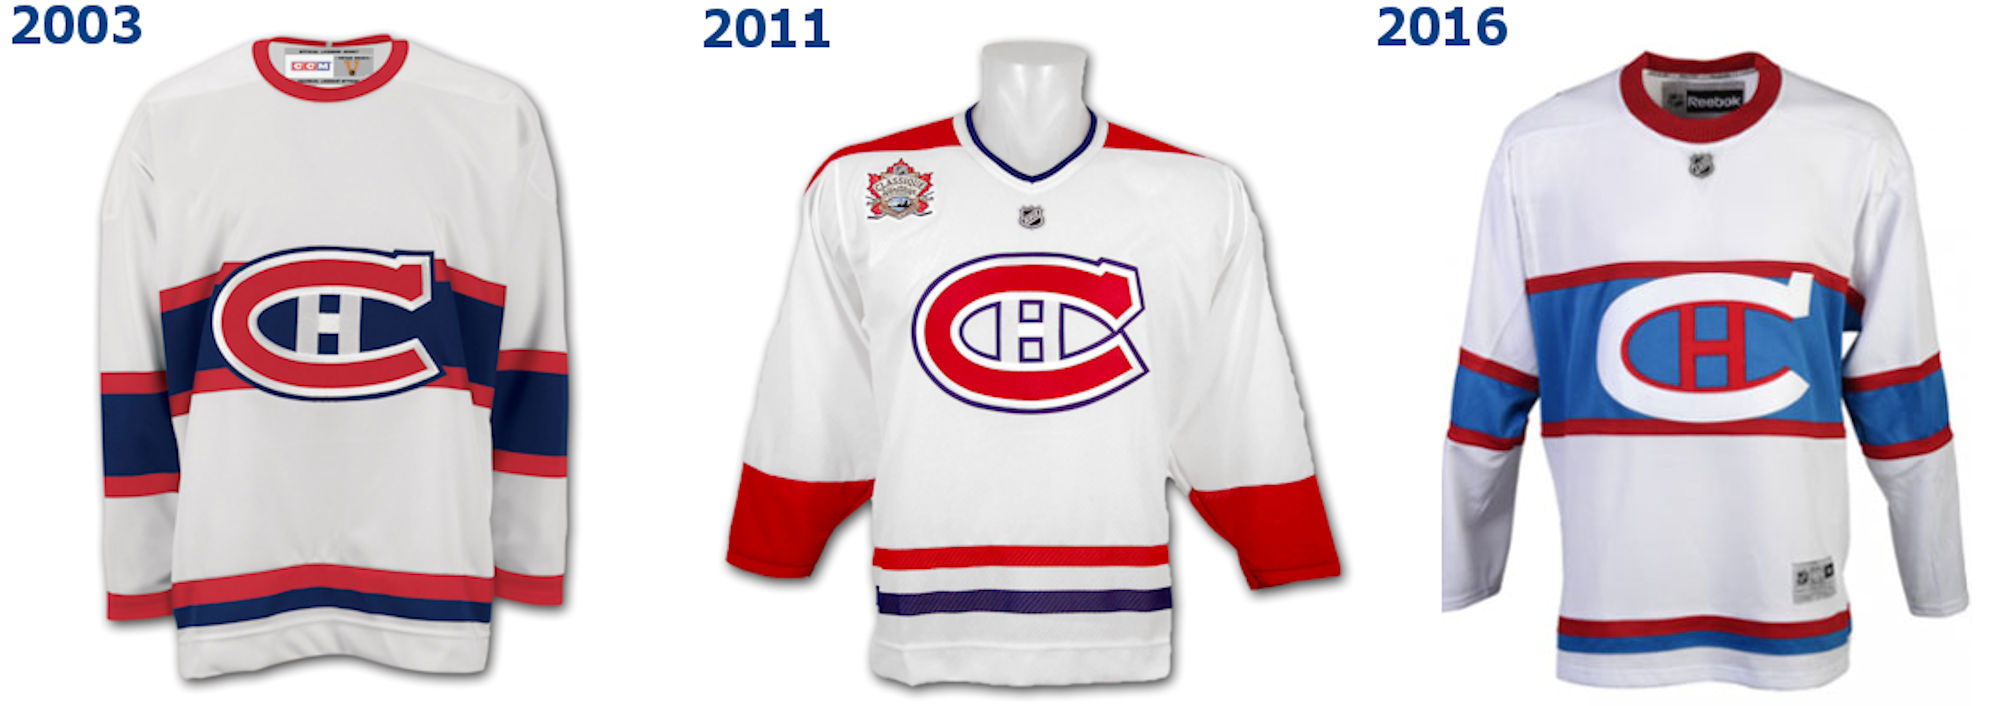 Cheap Hockey Shop Jersey Outdoor Online Jerseys Montreal